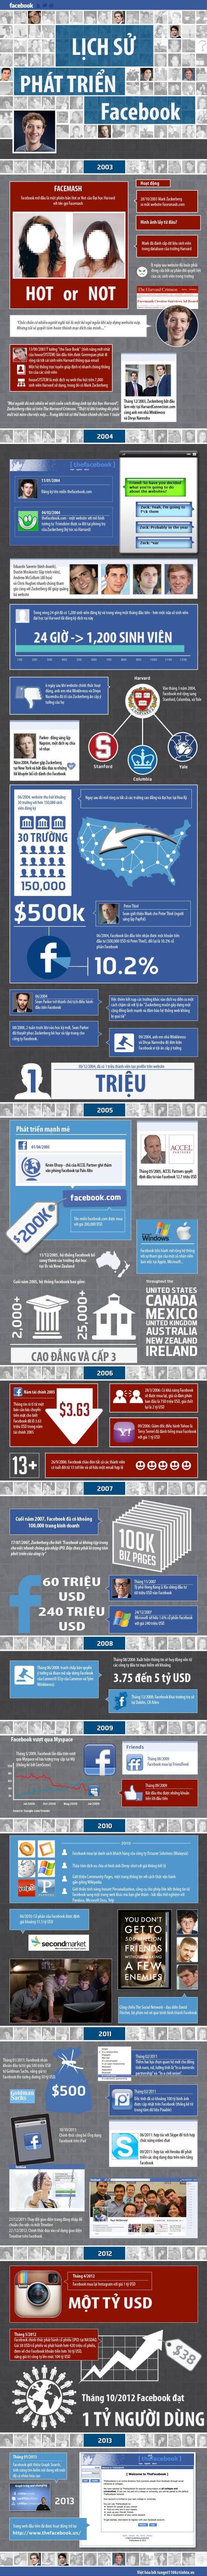 infographic-lich-su-10-nam-hinh-thanh-va-phat-trien-cua-facebook-514f2fa3908199a733f2af20859beade9e21fb43